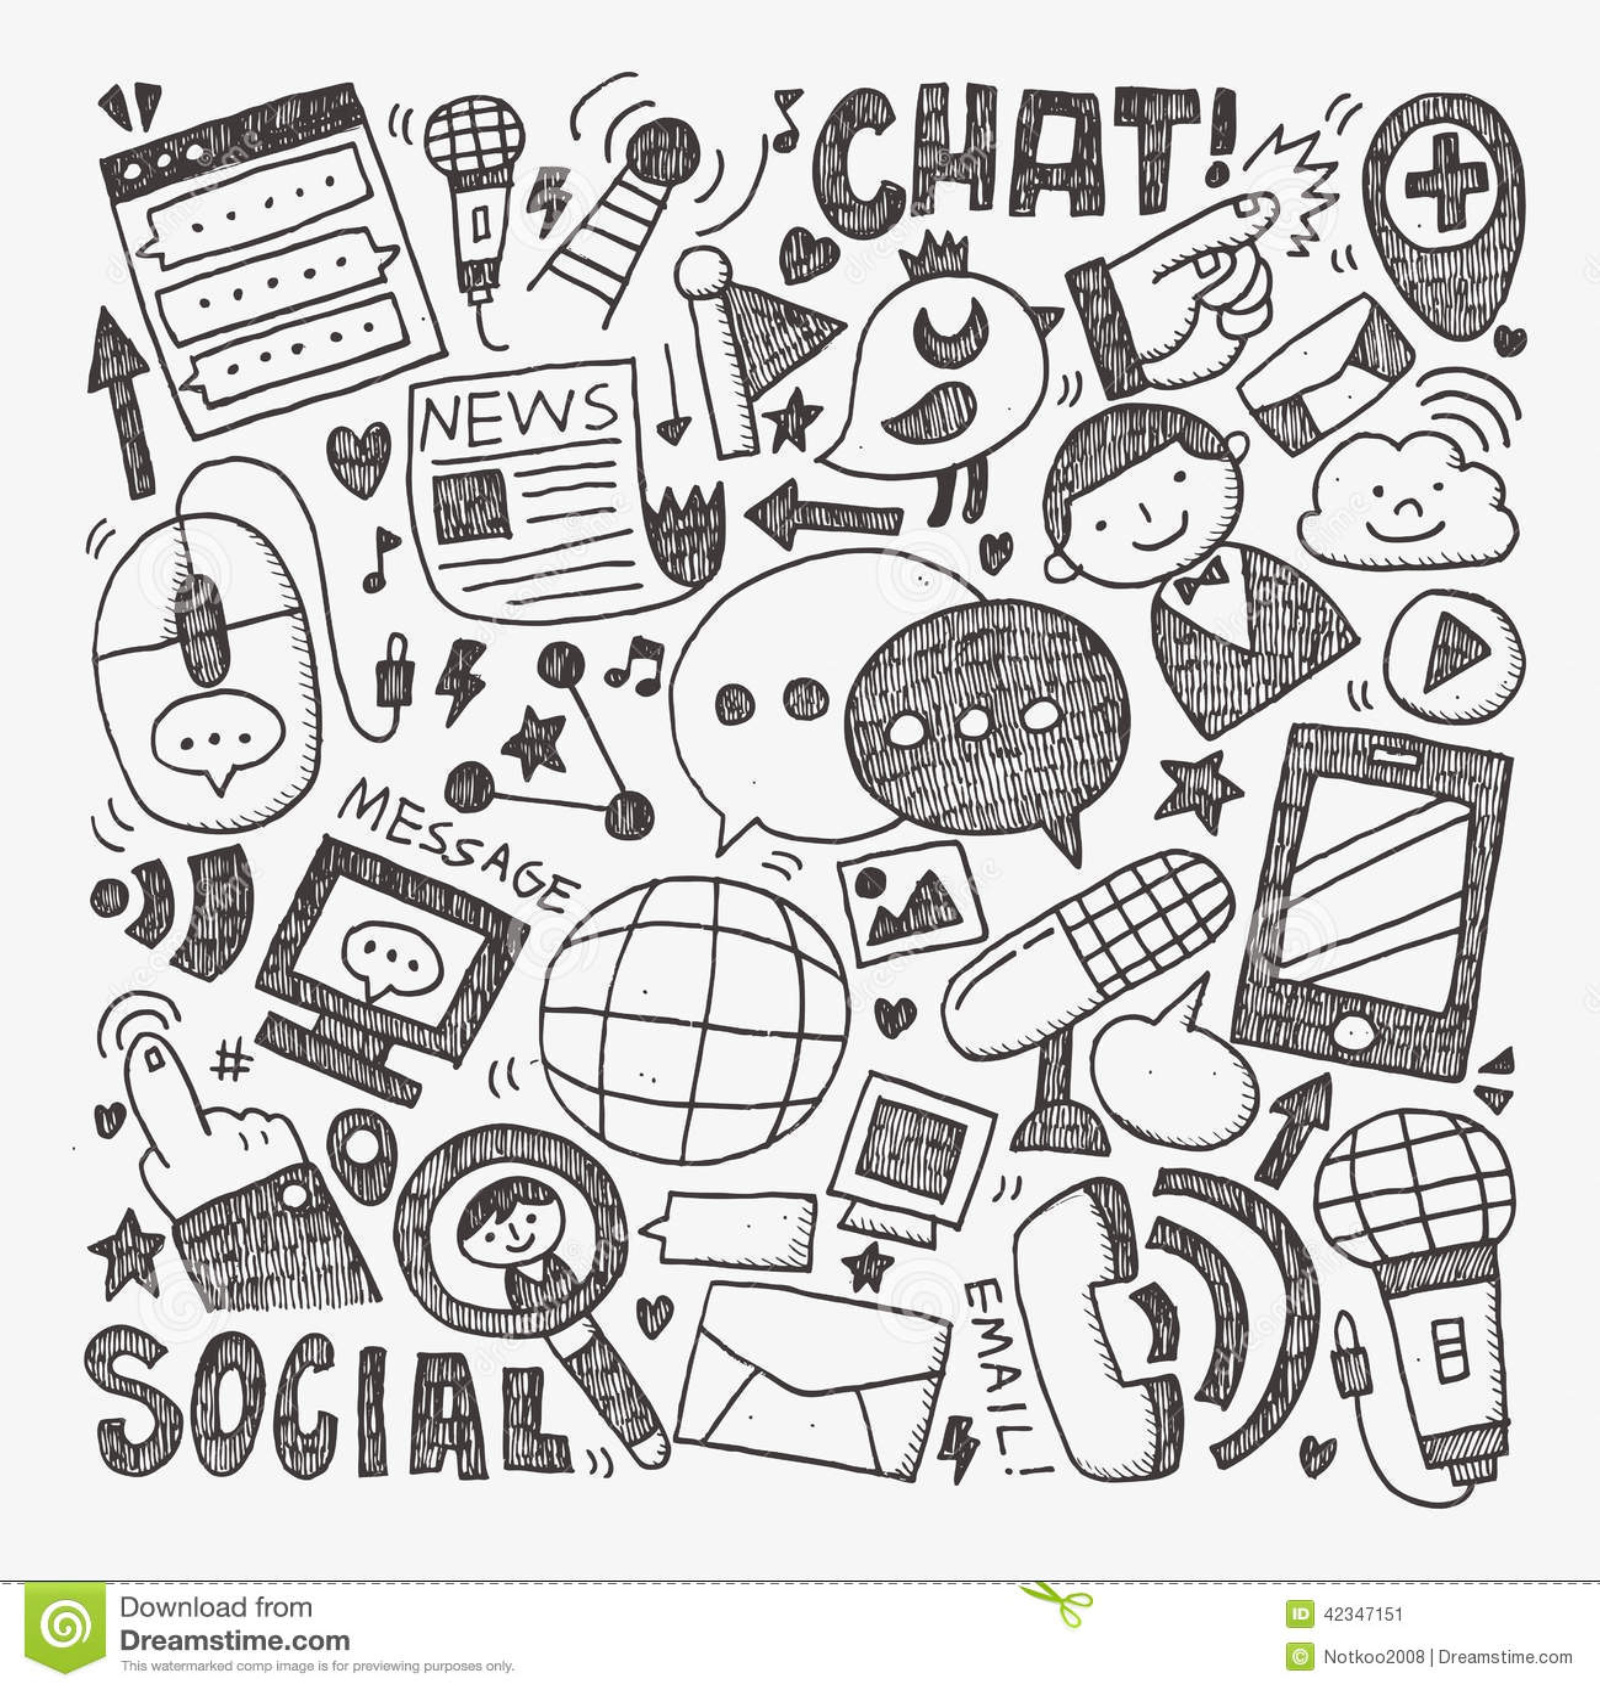 Doodle Communication Background Stock Vector - Image: 42347151